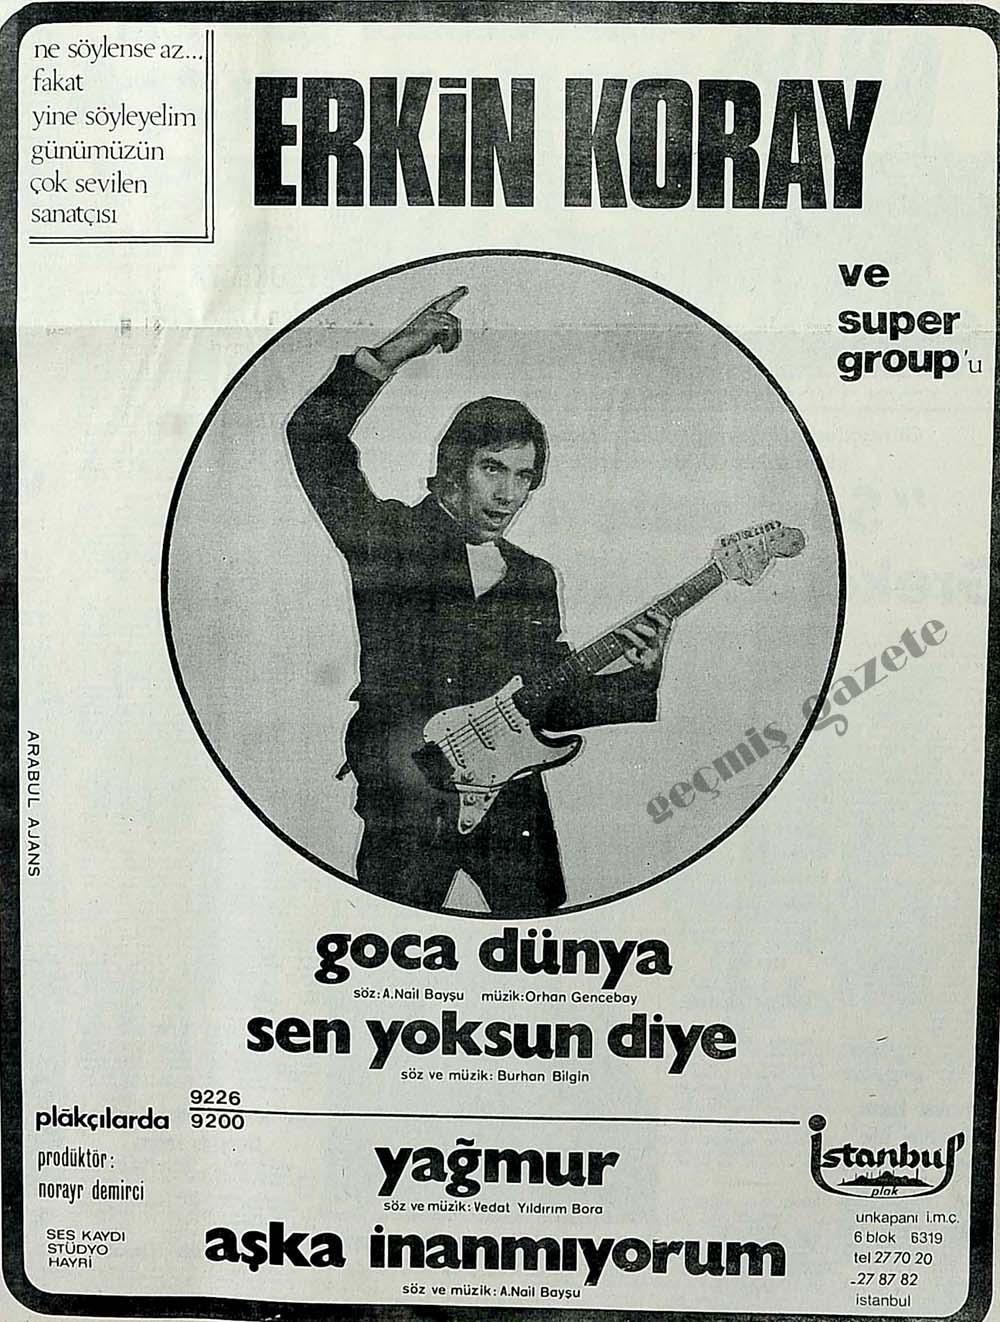 Erkin Koray ve super group